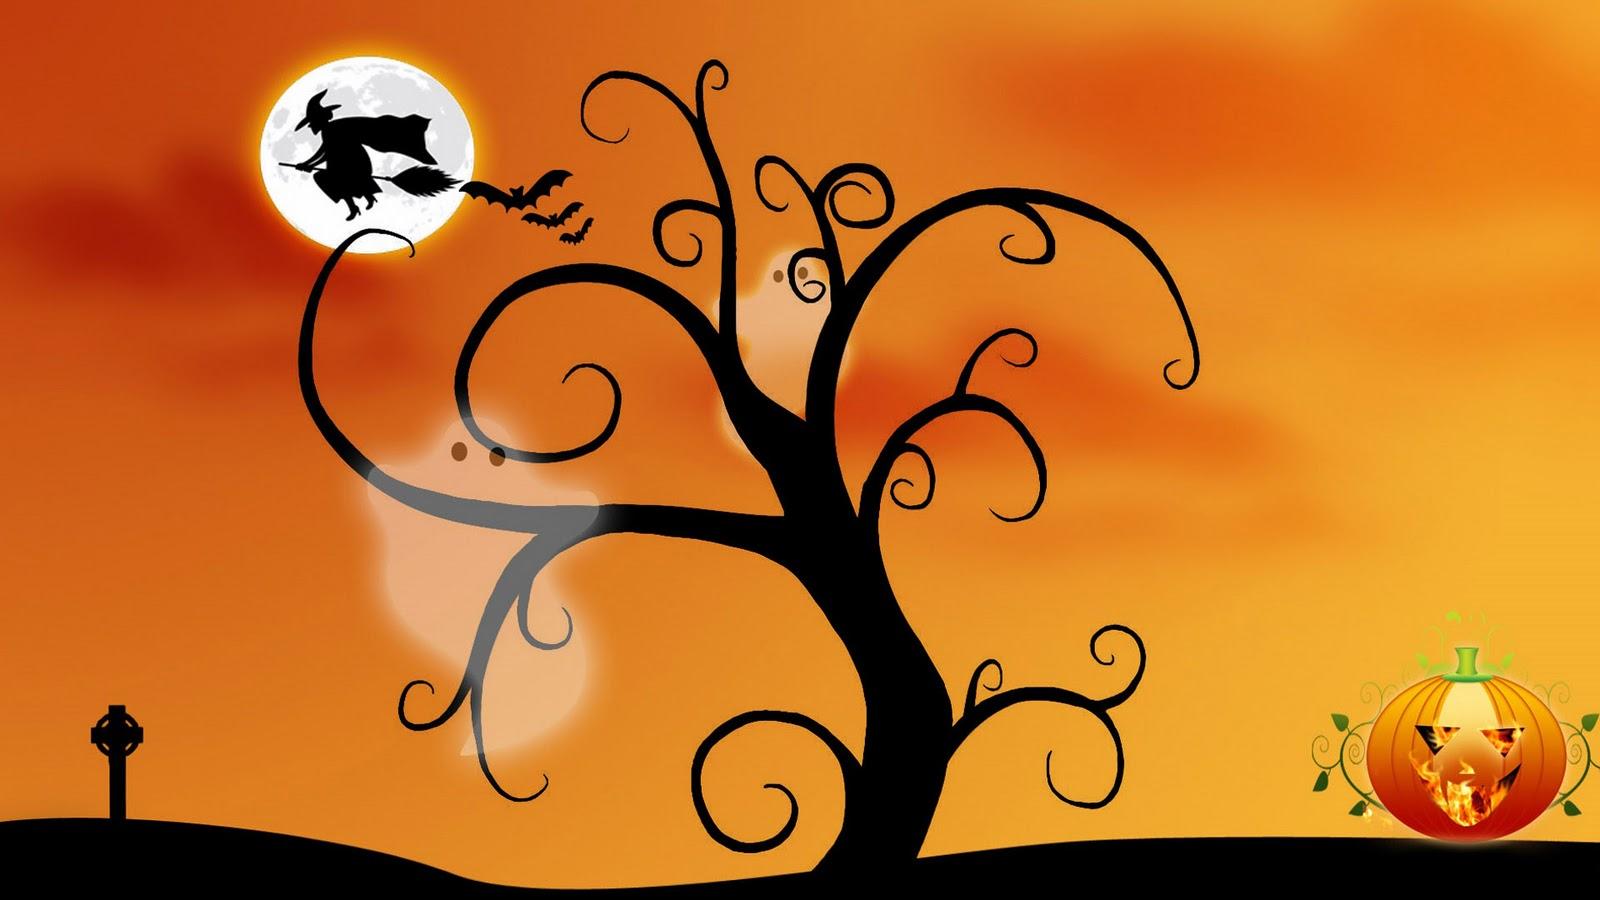 http://2.bp.blogspot.com/-hw5f-Vnw-e4/TsTaw7j8VtI/AAAAAAAABMU/NIpj04_3A0U/s1600/Halloween-desktop-Wallpapers-HD-photo-images-8.jpg